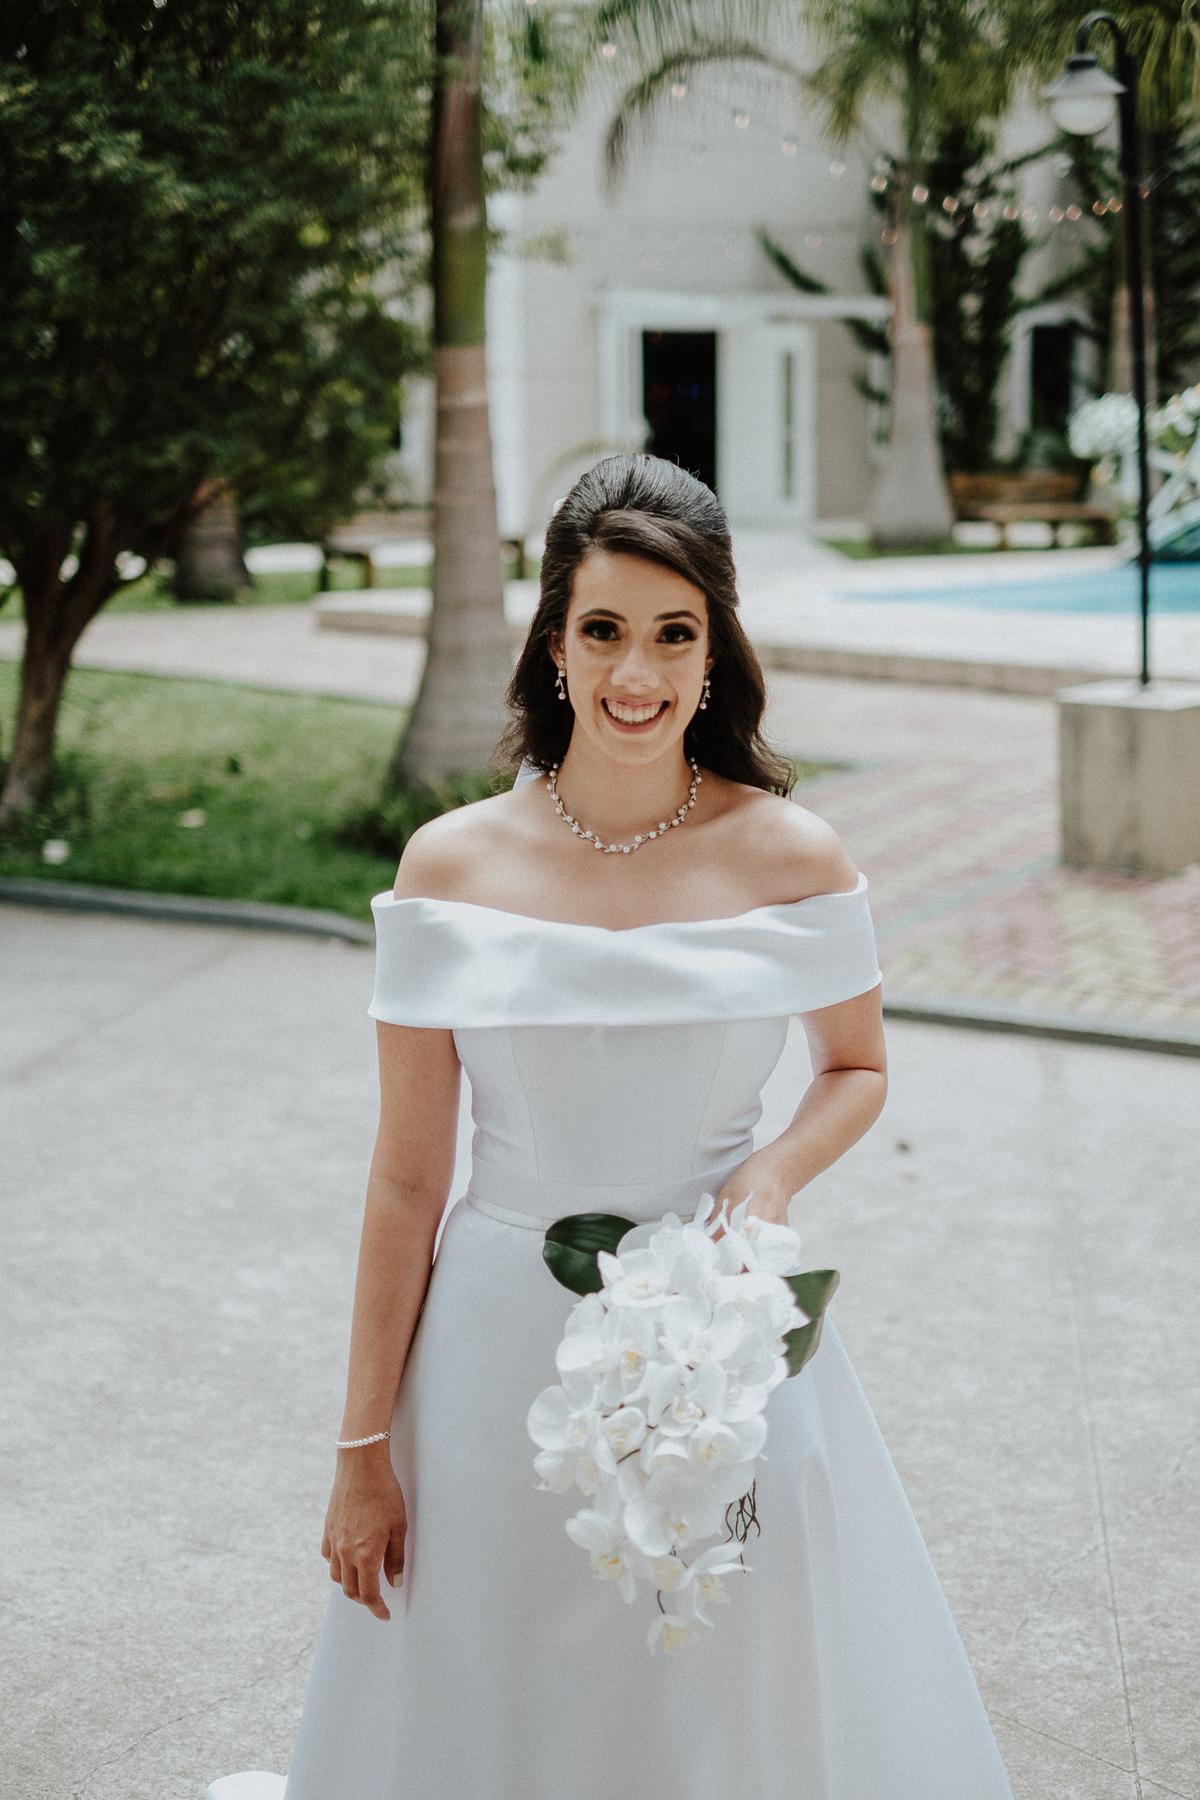 dia do noivo votos escritos casamentos de dia fotos por caio henrique casamento no campo entrada do noivo elopement casamentos em mairipora entrada da noiva